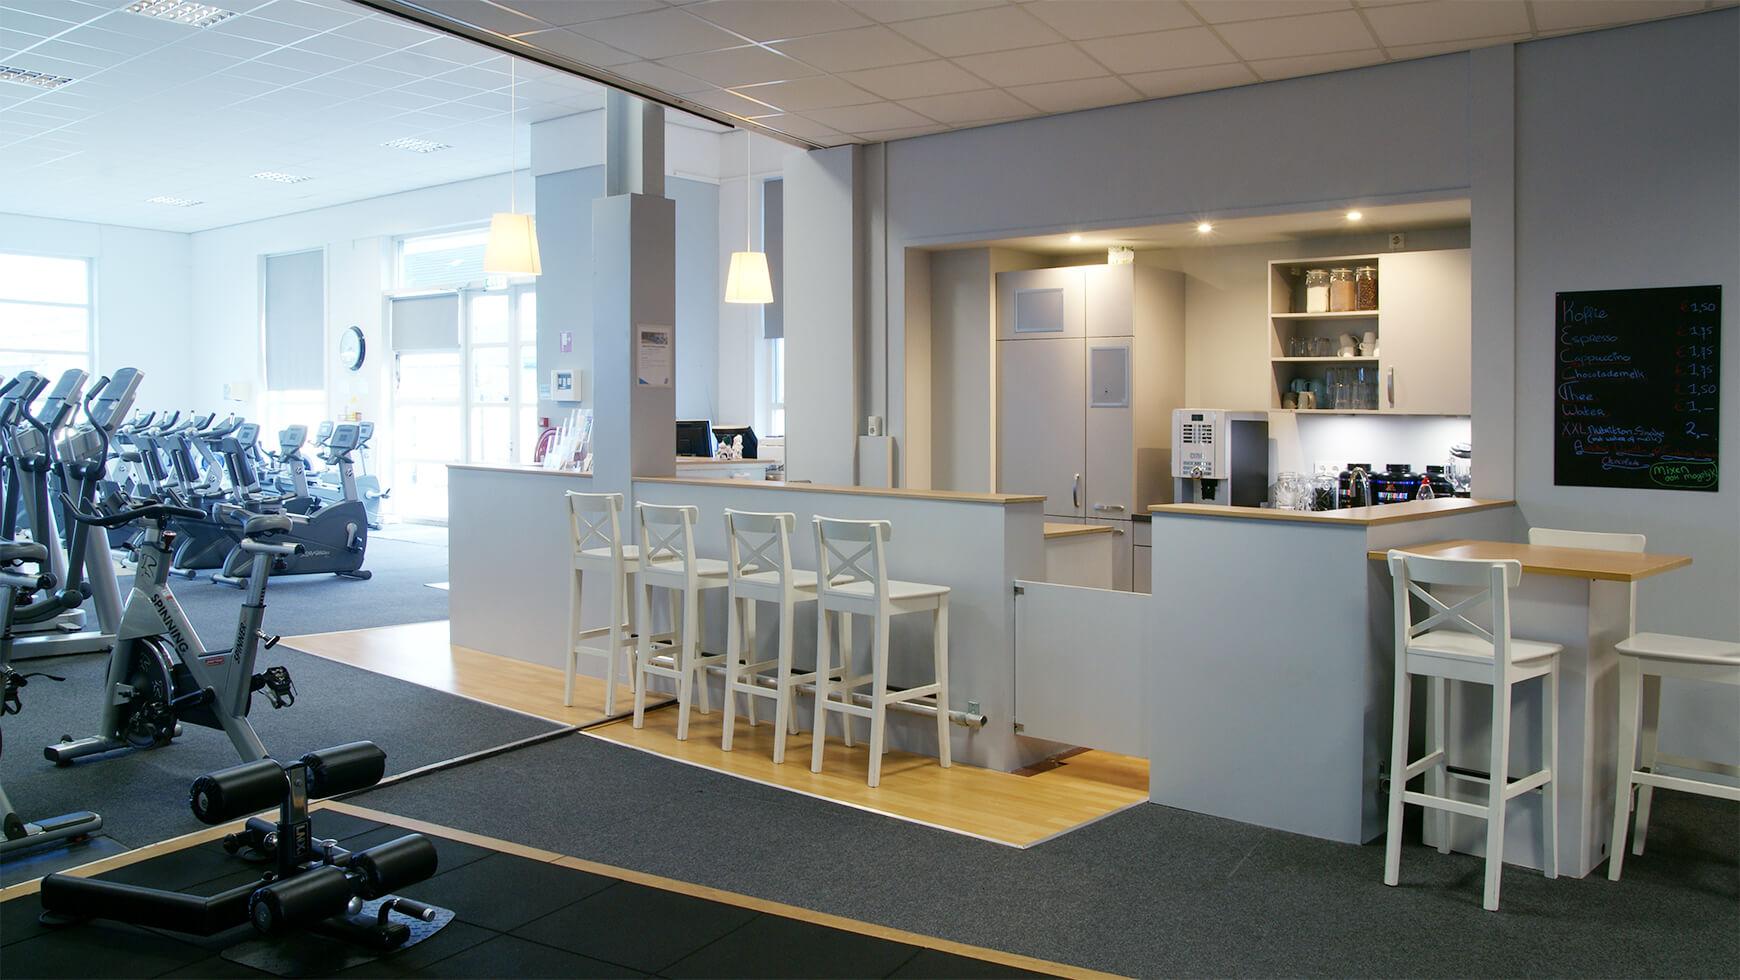 Bar Sportcentrum Bfit